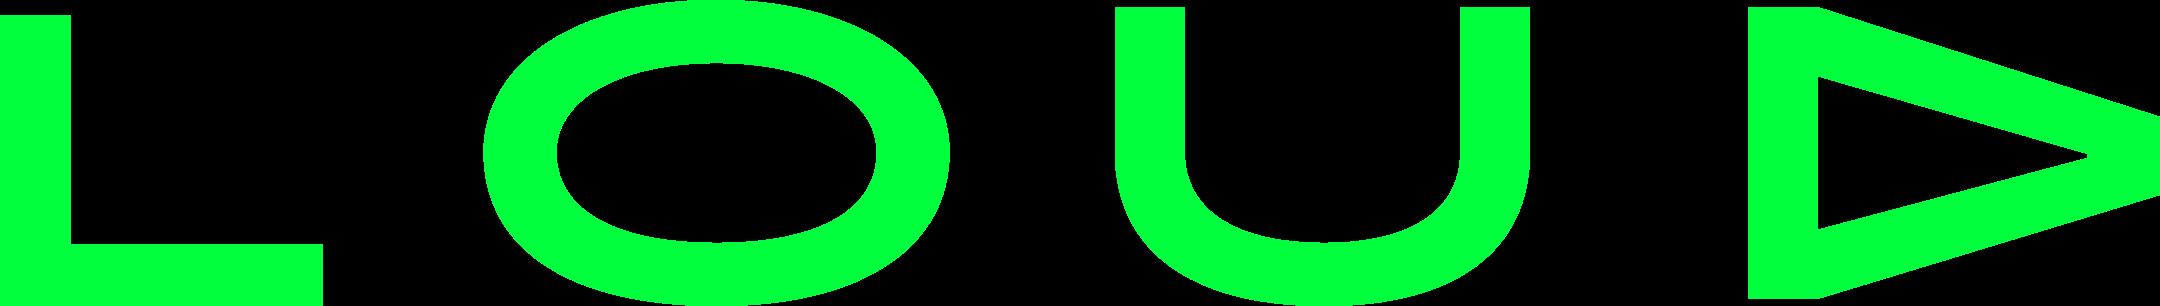 loud logo 1 - LOUD Logo